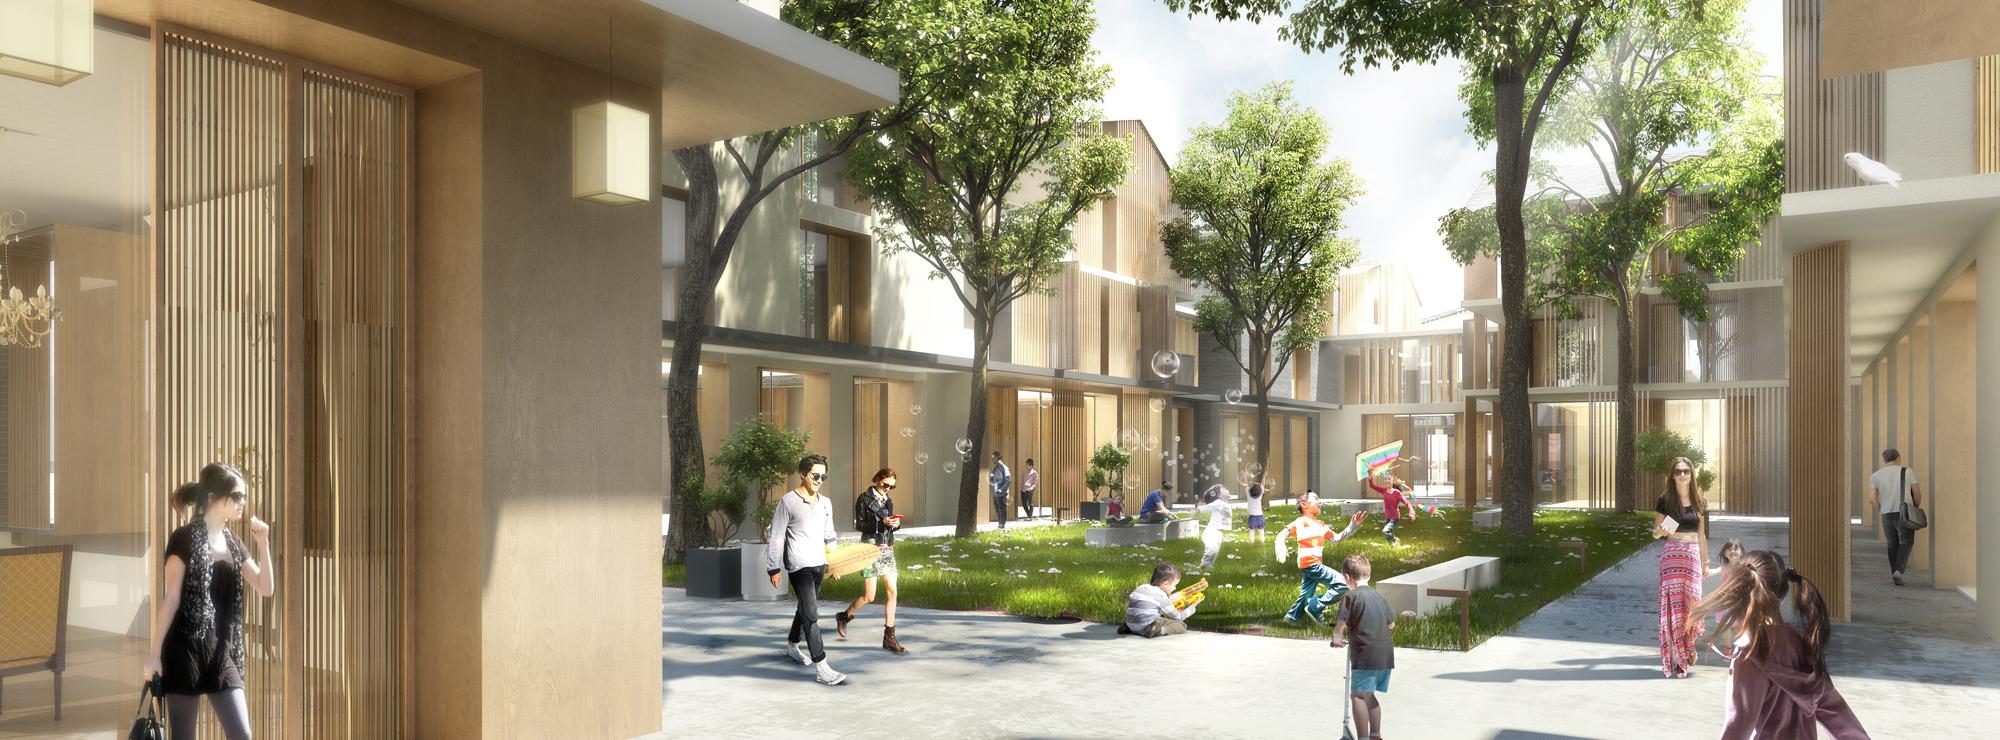 XionanDuanVillage_Stadtplanung_Wohnentwicklung, Gesellschaft,China